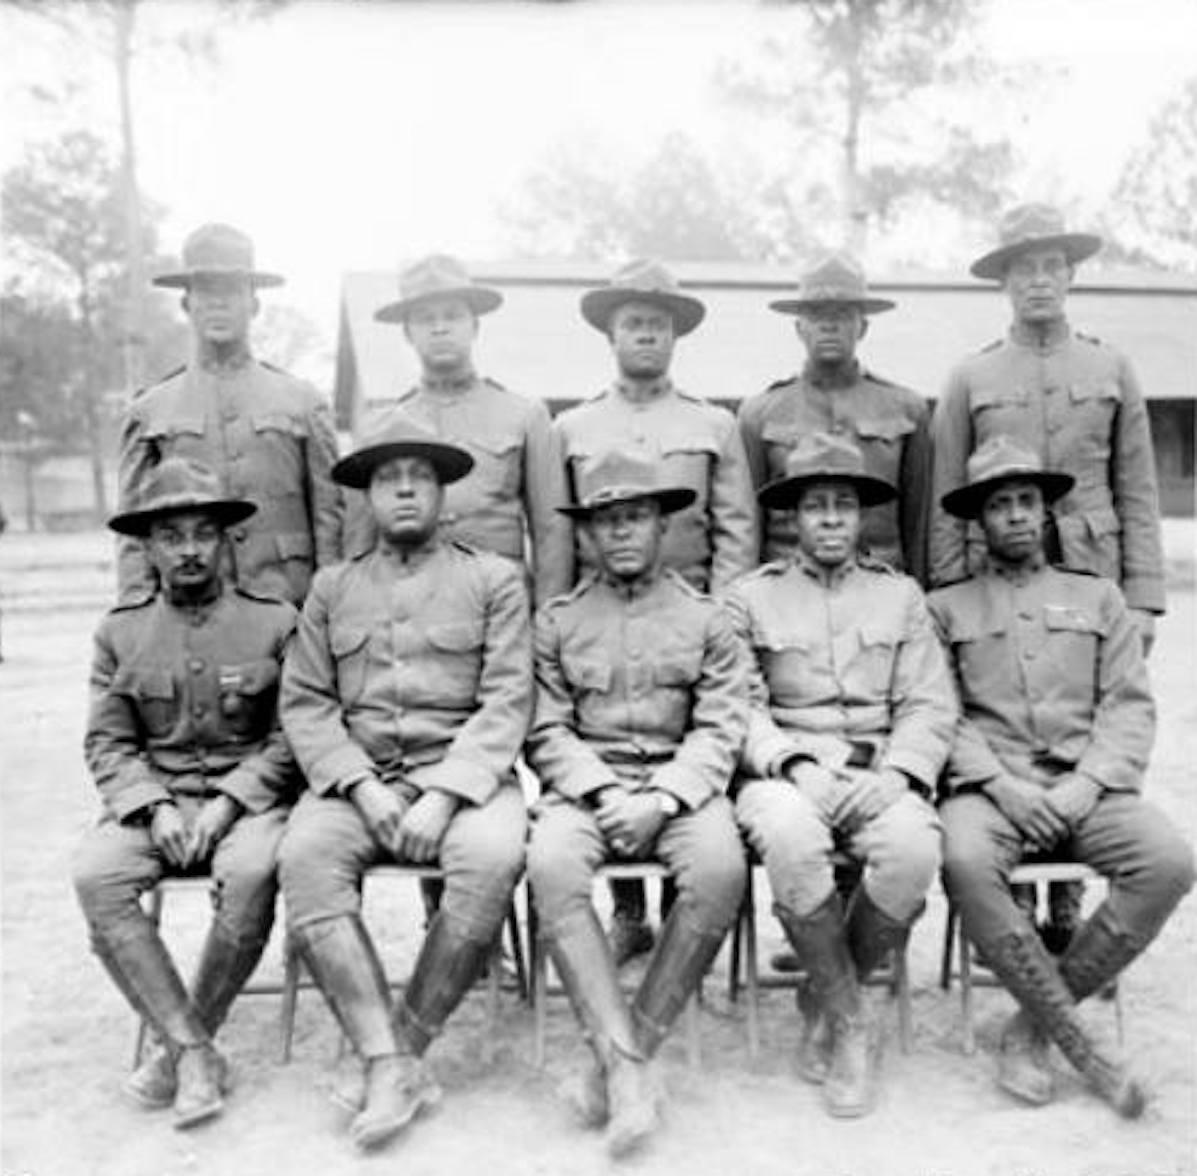 Houston Mutiny and Riot of 1917, African American Veterans, African American History, American Racism, Racism, US Racism, KOLUMN Magazine, KOLUMN, KINDR'D Magazine, KINDR'D